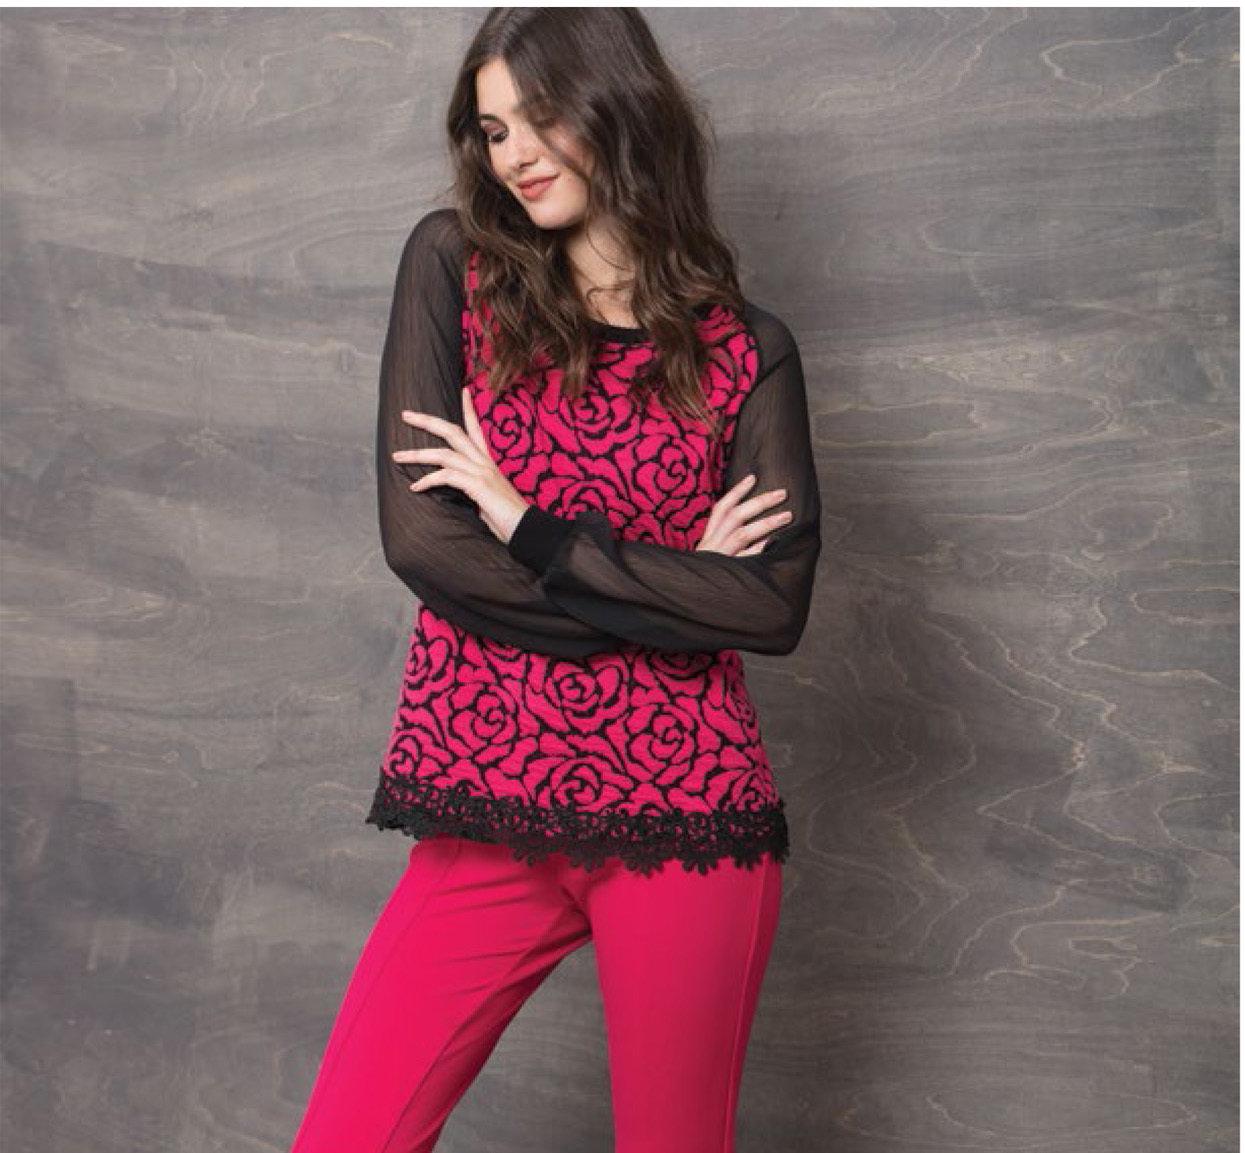 Maloka: Fuschia Rose Imprinted Asymmetrical Hem Sweater (2 Left!) MK_MARIE_N2